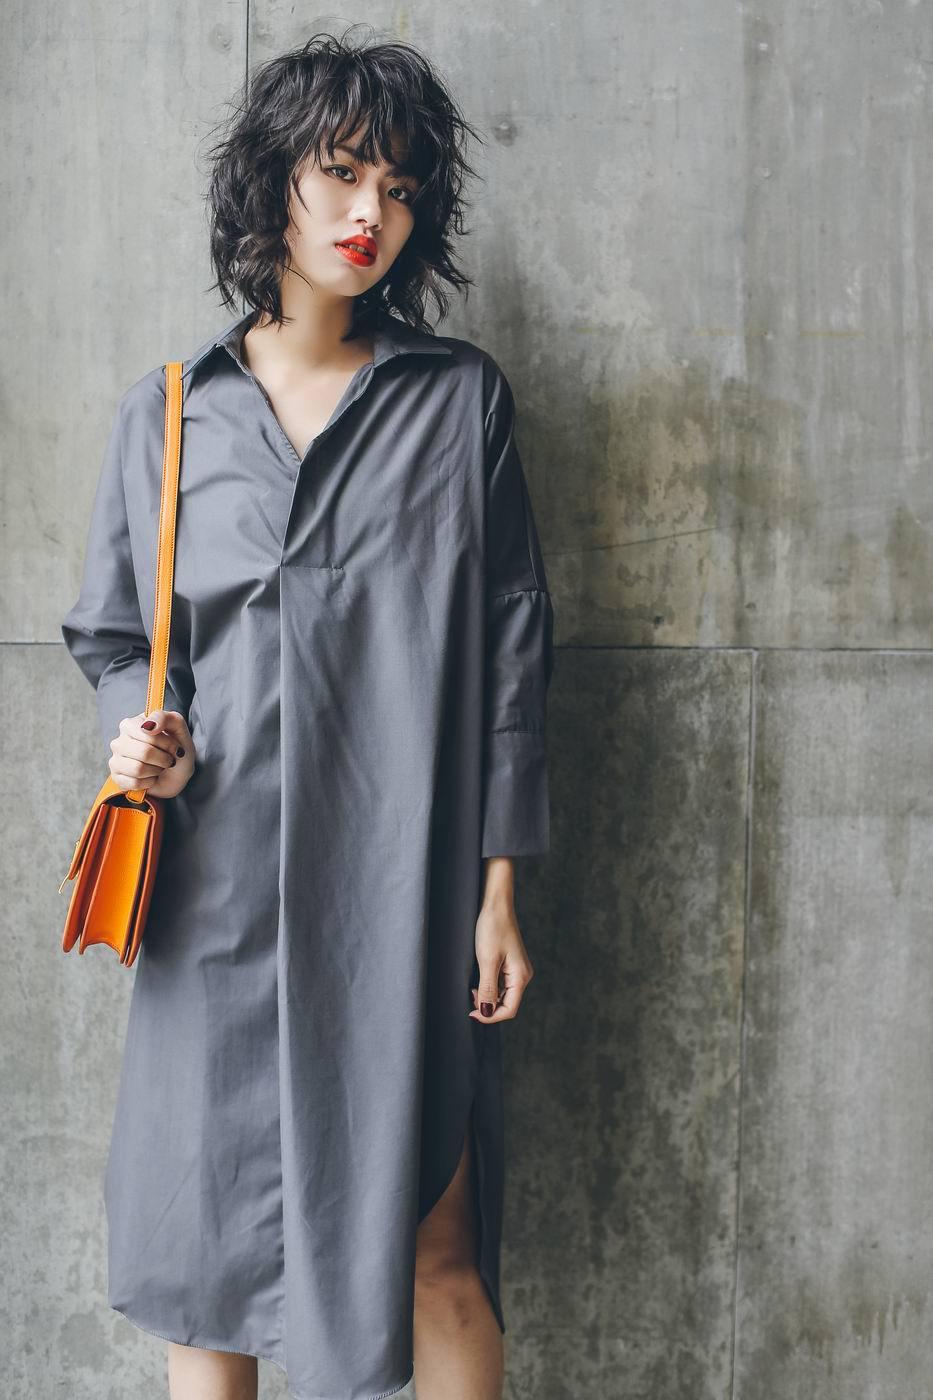 women long blouse with long sleeves Loose Shirt dress summer 2016 2015 women korean blouses women long blouses high quality